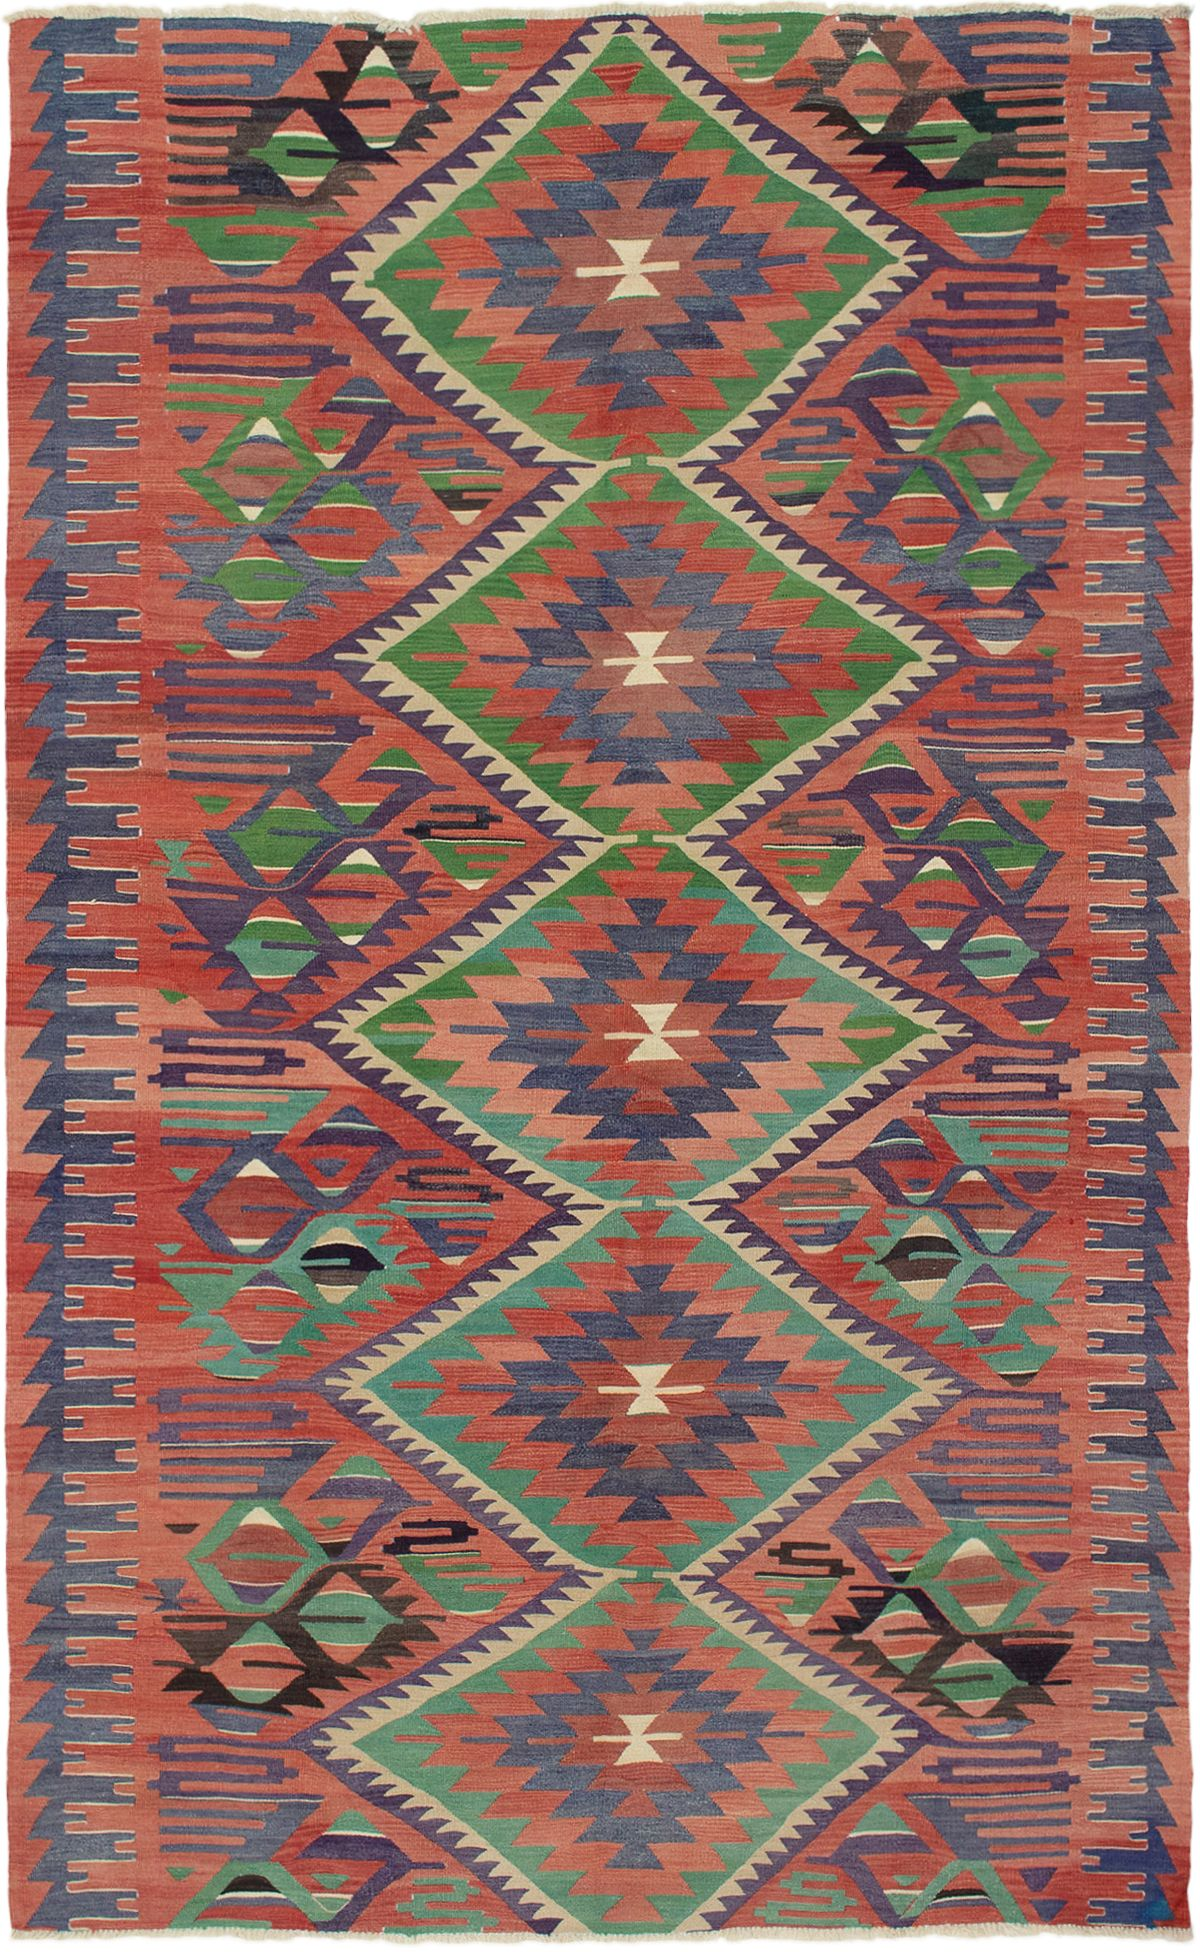 "Hand woven Sivas Dark Copper Wool Kilim 5'11"" x 10'3"" Size: 5'11"" x 10'3"""